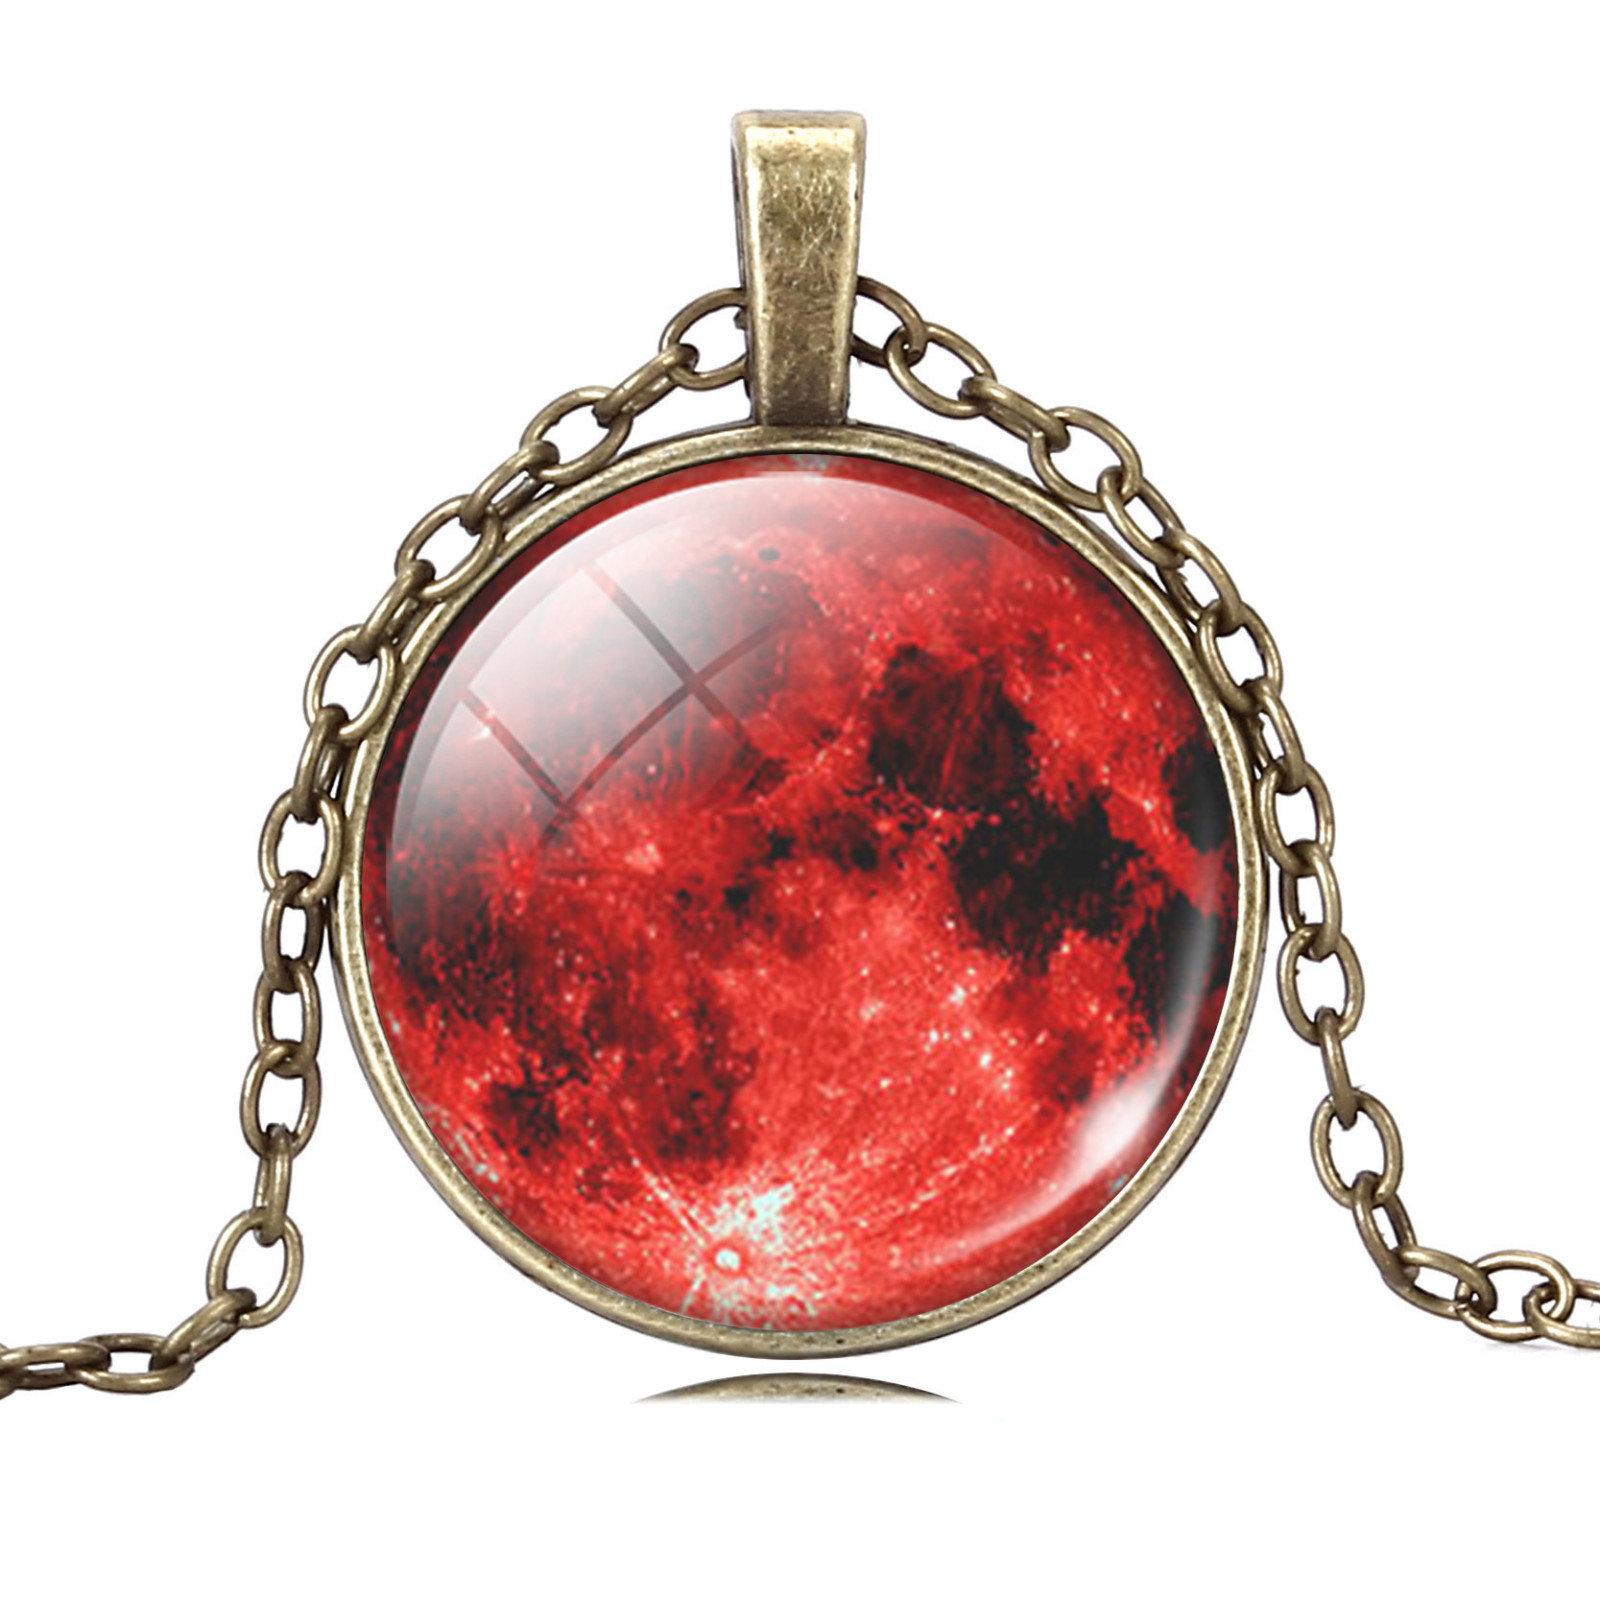 Full Moon Glass Бронзовый ожерелье цепь